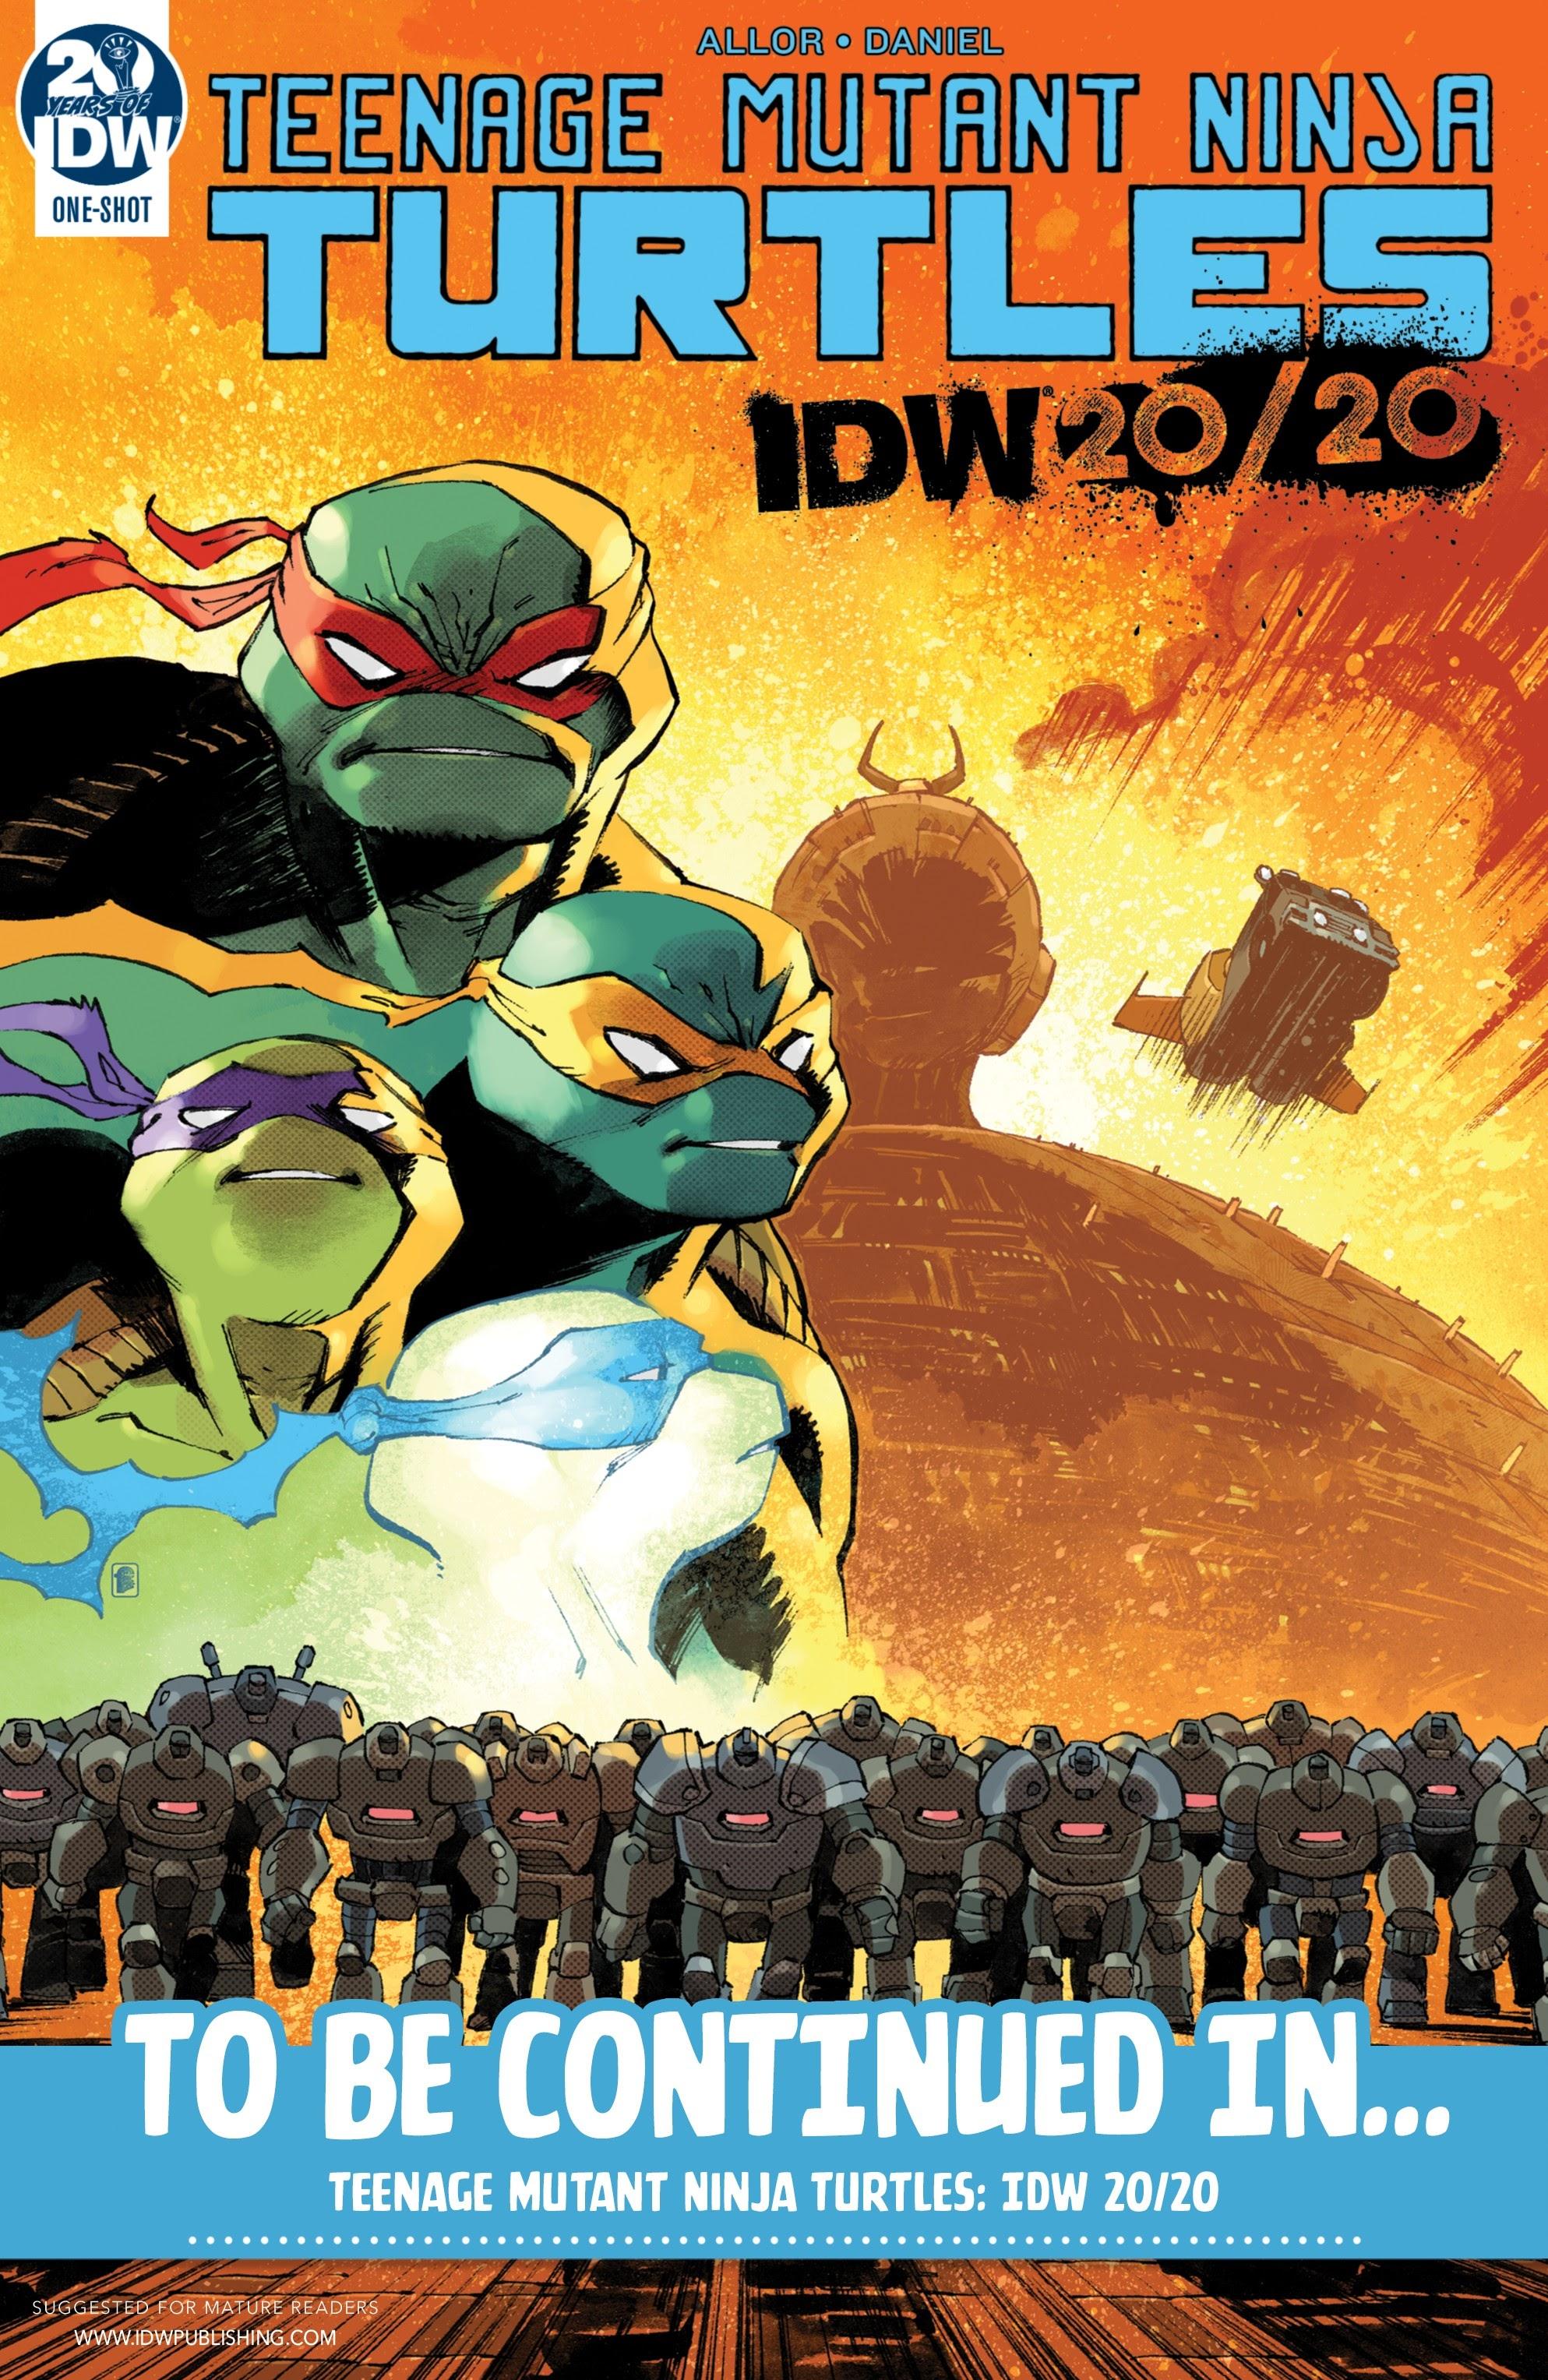 Teenage Mutant Ninja Turtles: Shredder in Hell Issue # 2 - ReadComic.Org